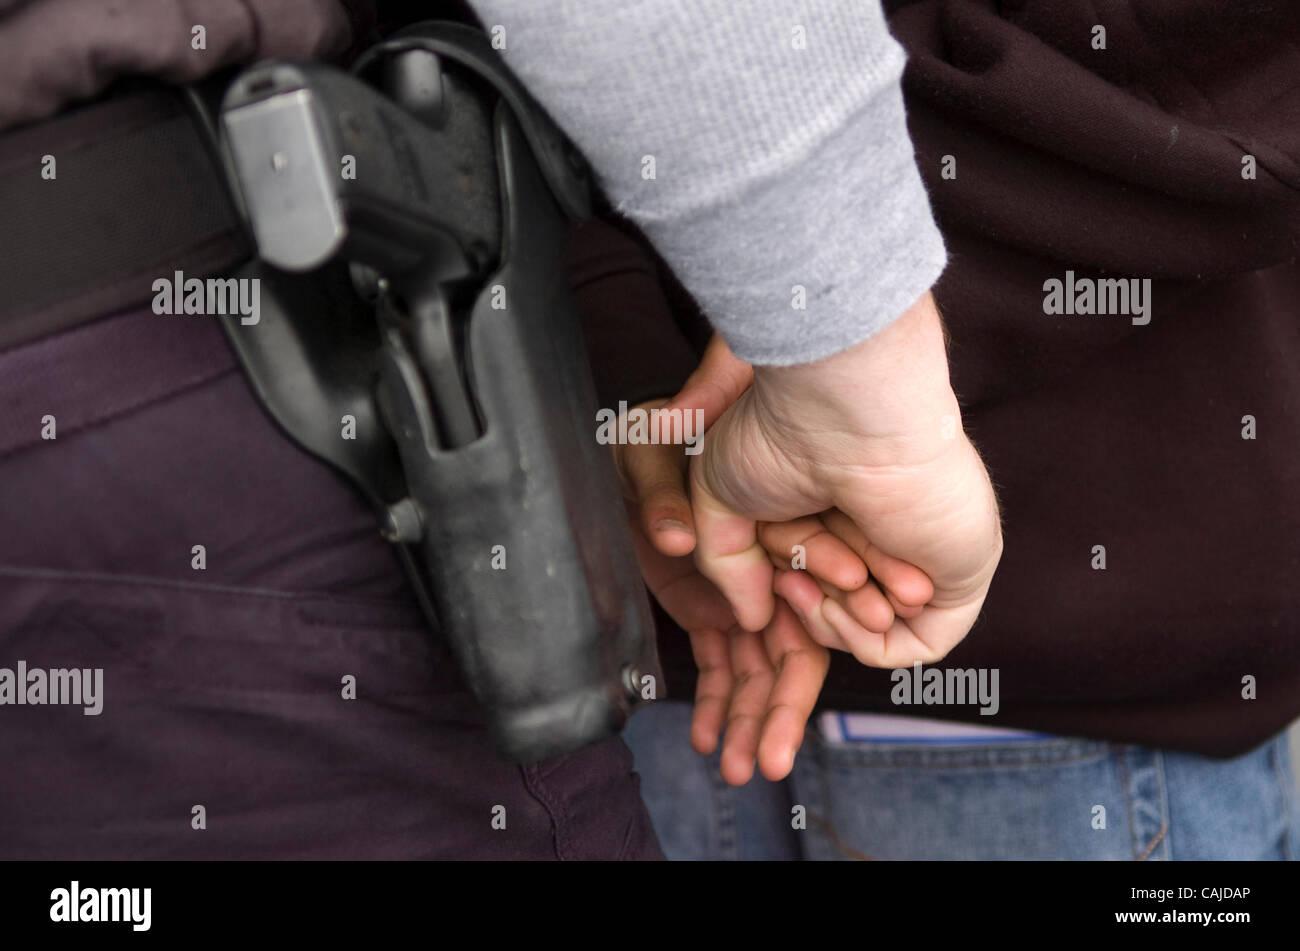 Jan 23, 2008 - Elk Grove, California, USA - Members of the Elk Grove police department street crimes unit conduct - Stock Image